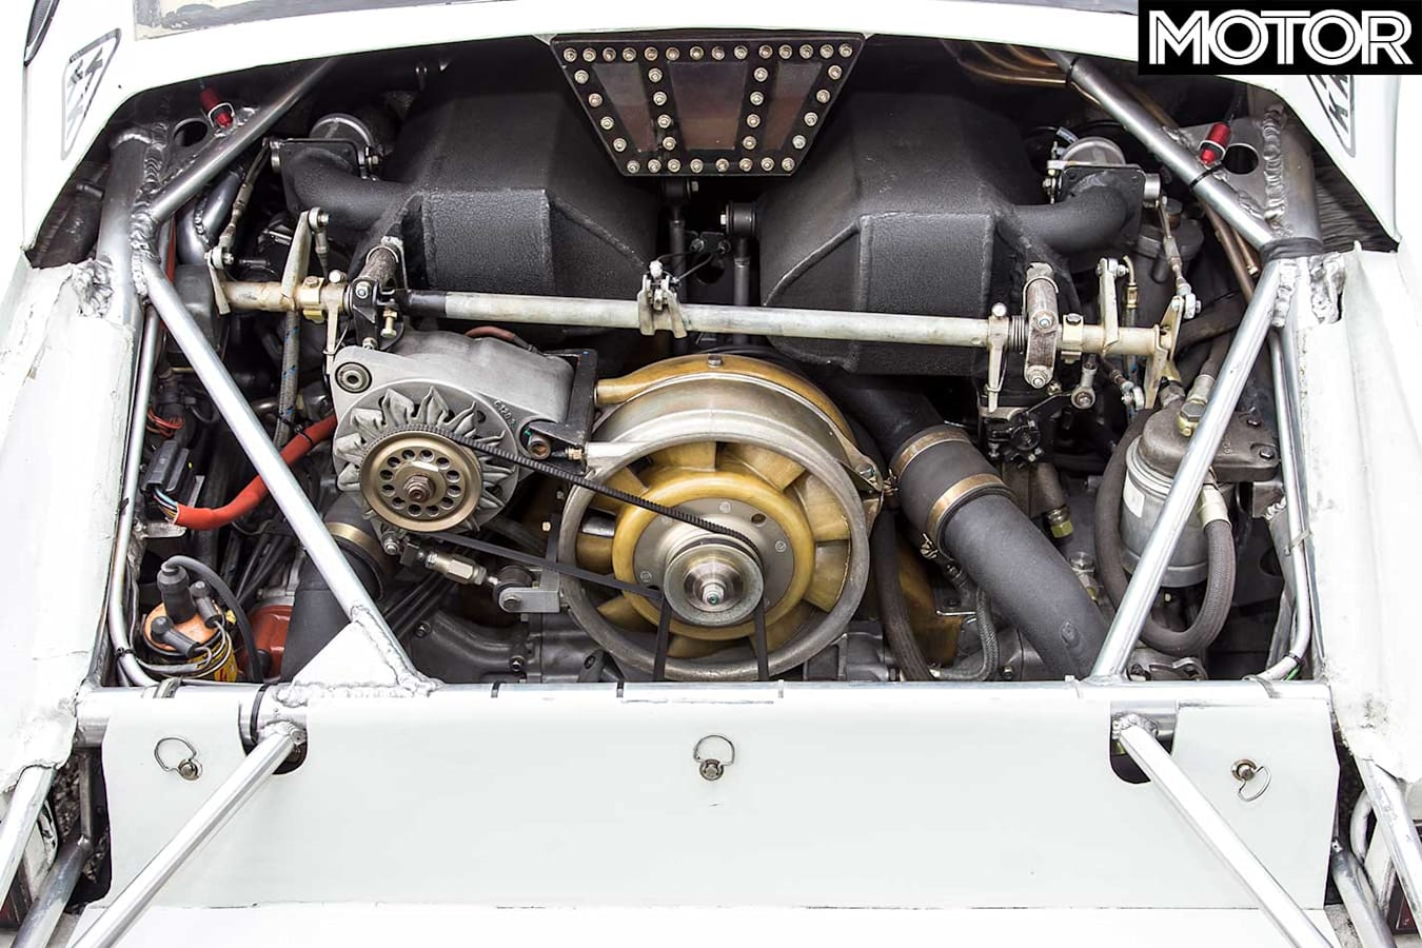 Porsche 935 78 Moby Dick Engine Jpg